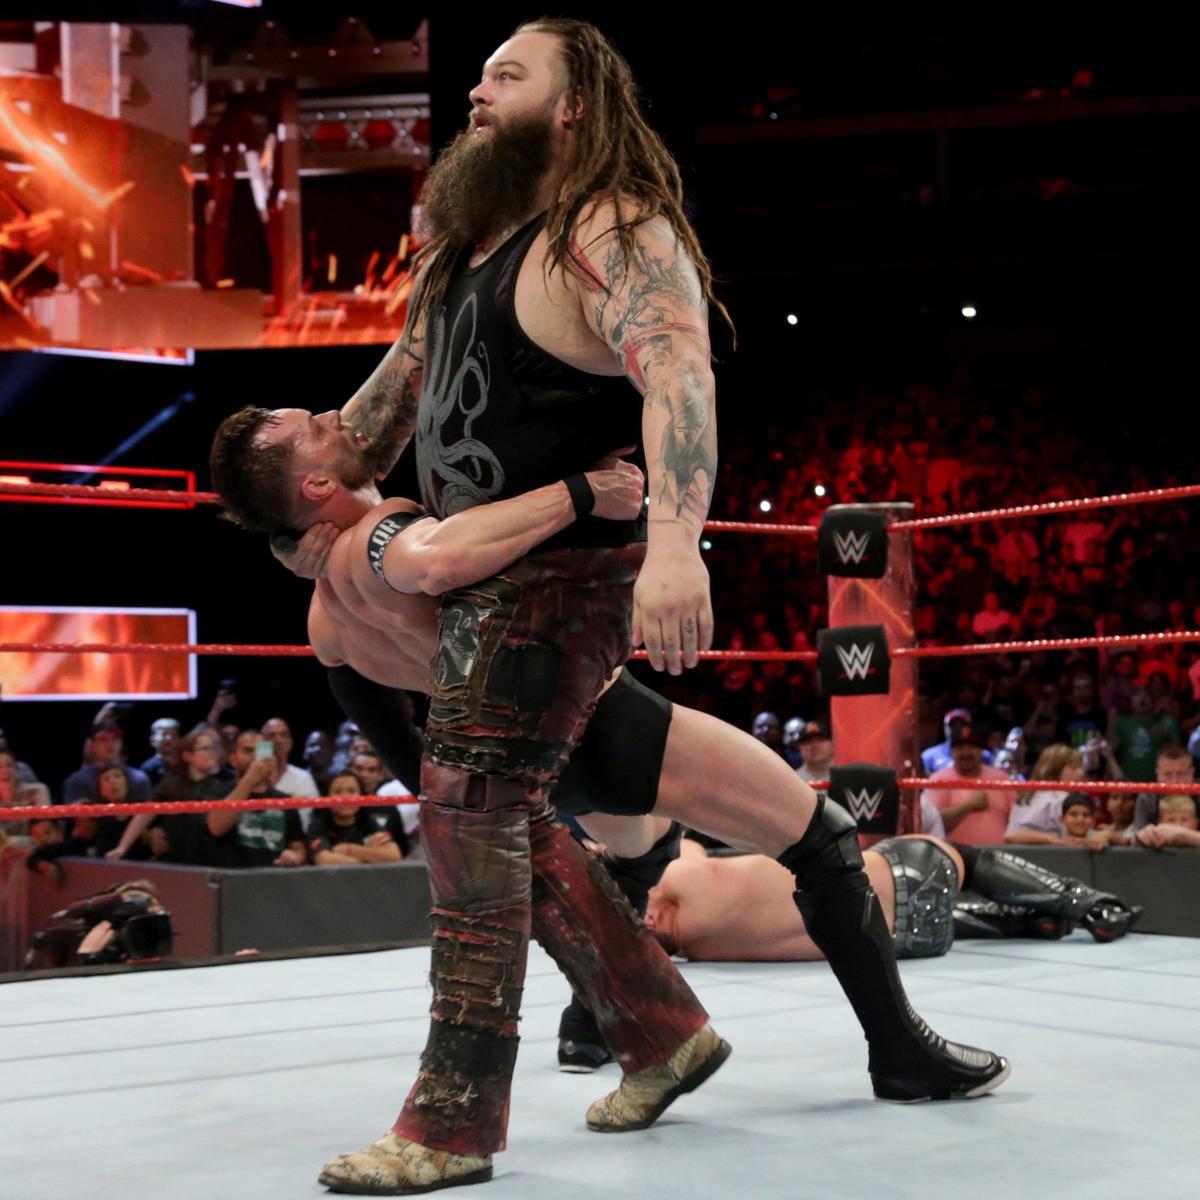 Wyatt plants Bálor with Sister Abigail...